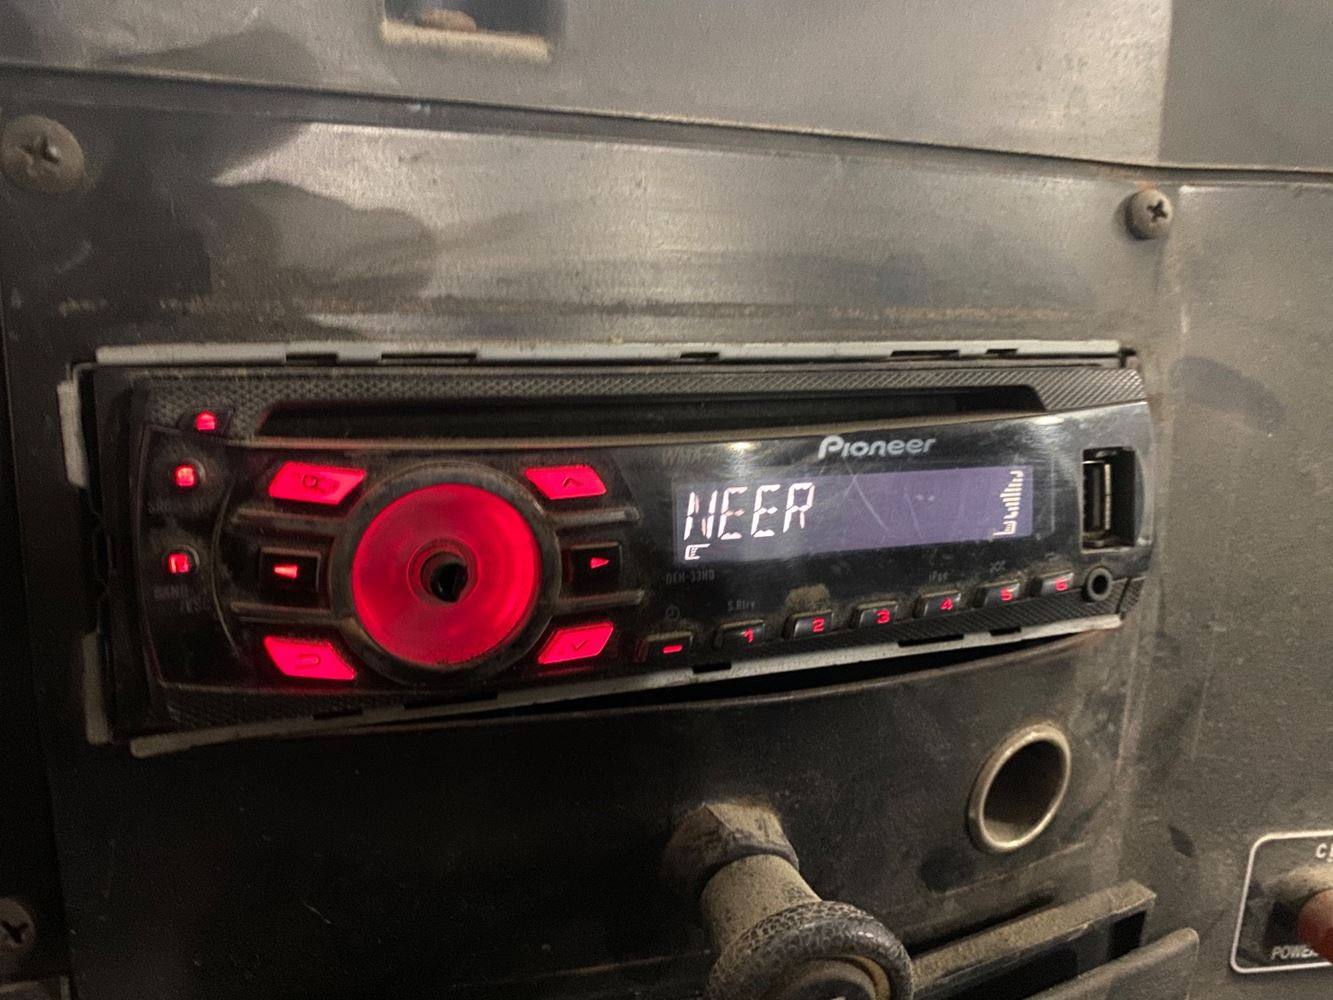 1994 INTERNATIONAL 4900 RADIO TRUCK PARTS #719994